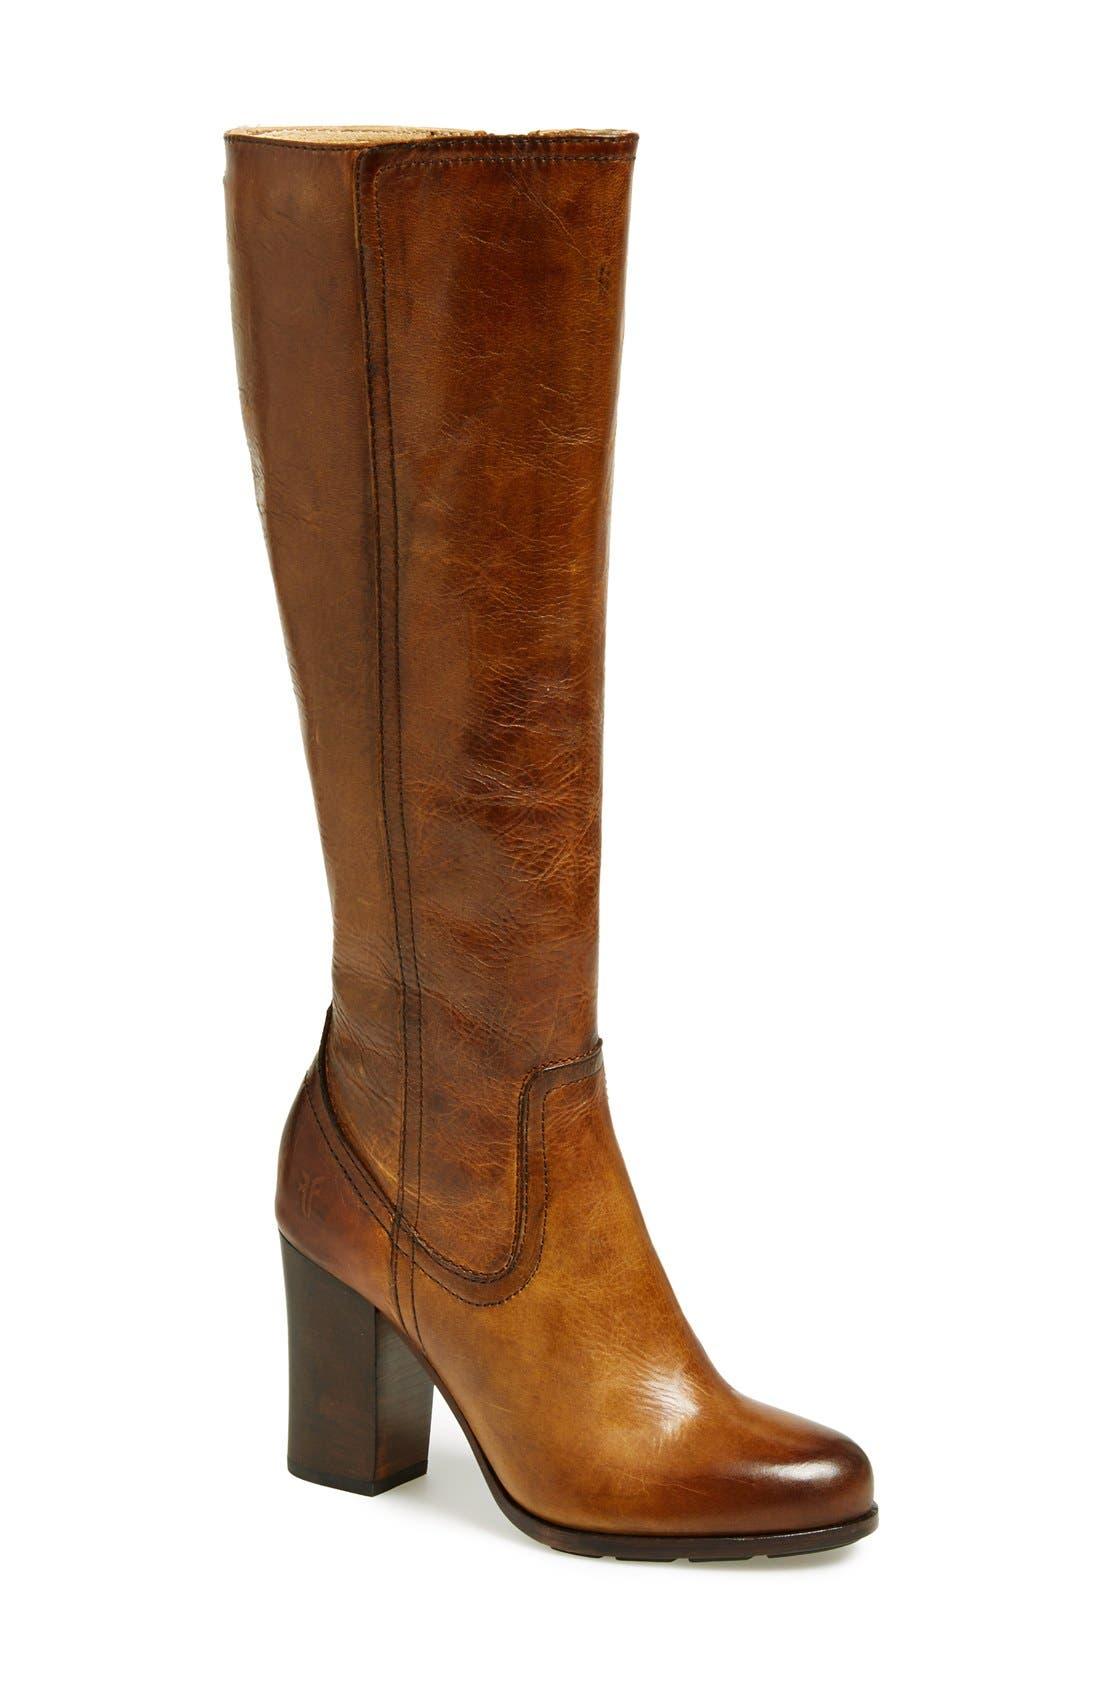 Alternate Image 1 Selected - Frye 'Parker' Tall Boot (Women)